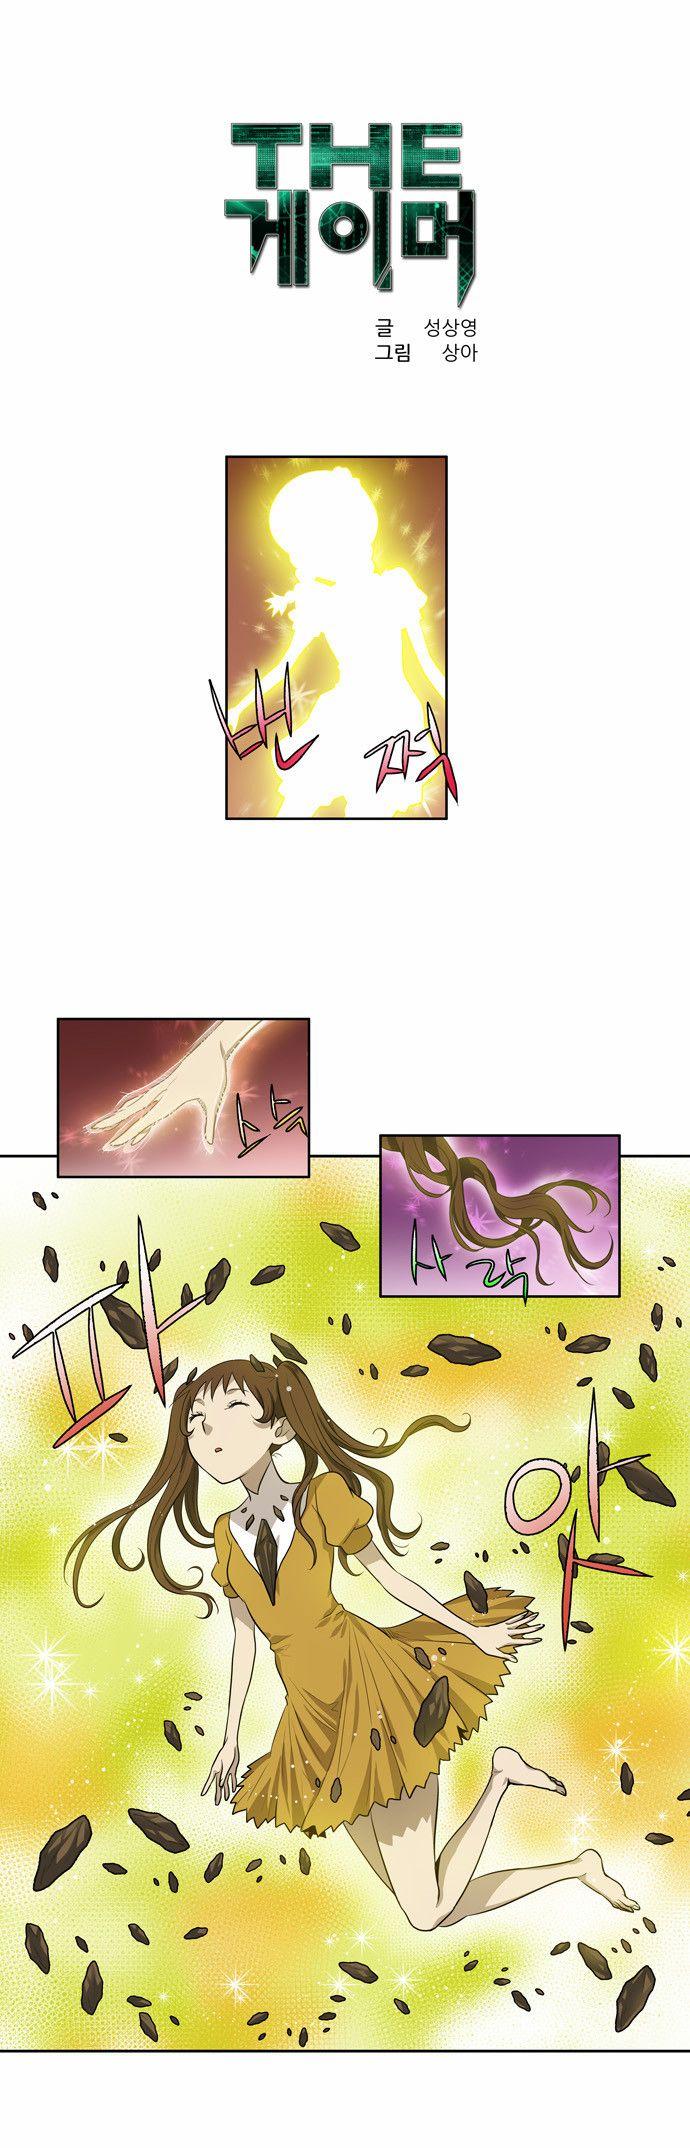 https://c5.ninemanga.com/es_manga/61/1725/464476/08a060a61b90a099b277ce6a1982dfbb.jpg Page 2